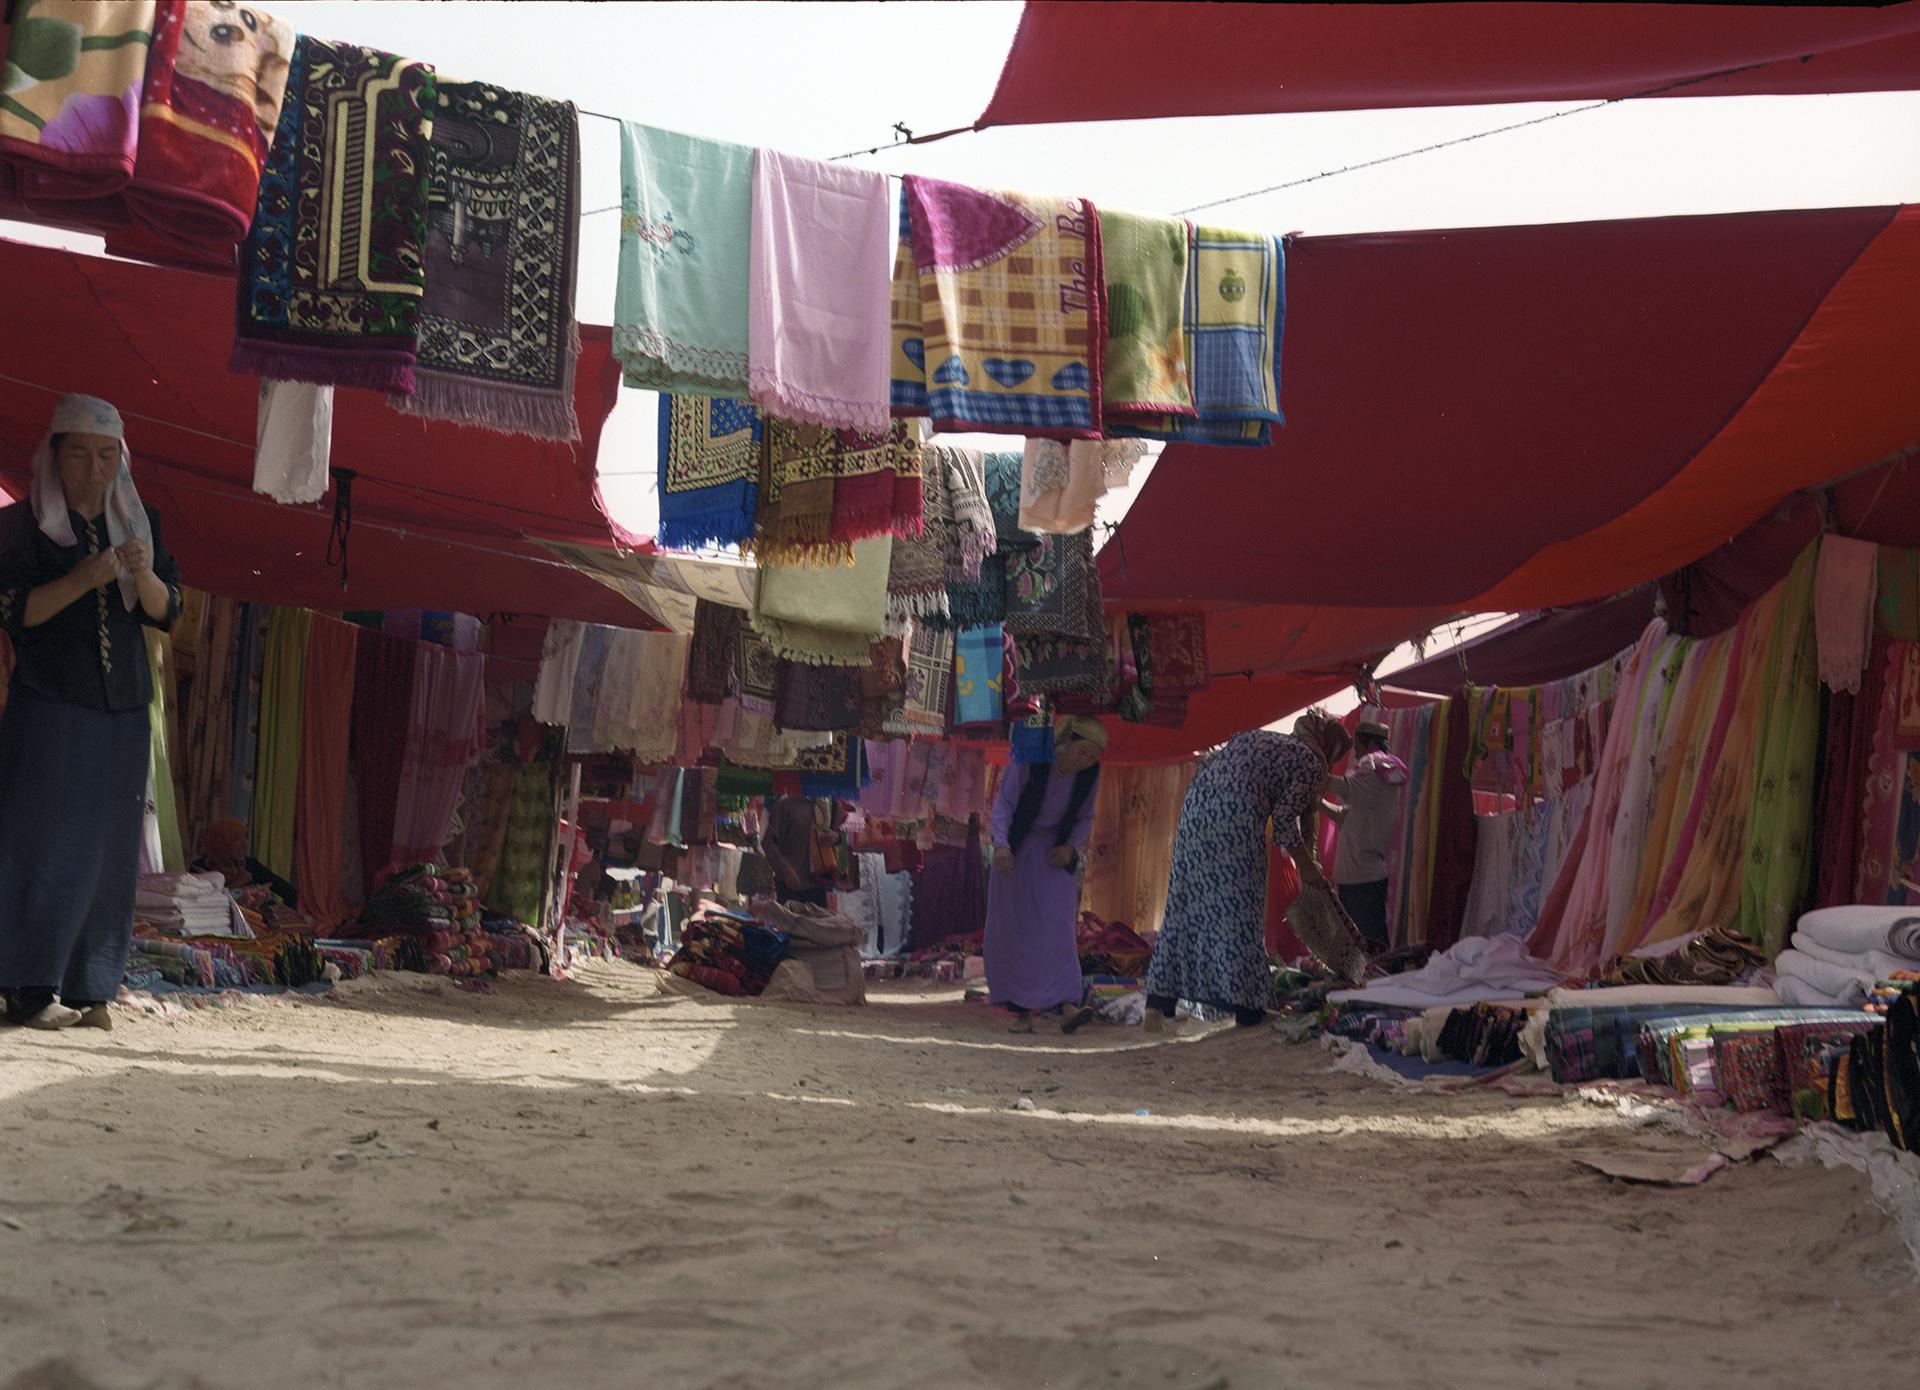 2007 Xinjiang - local market at Kuriyä. A full lane of women's delight.